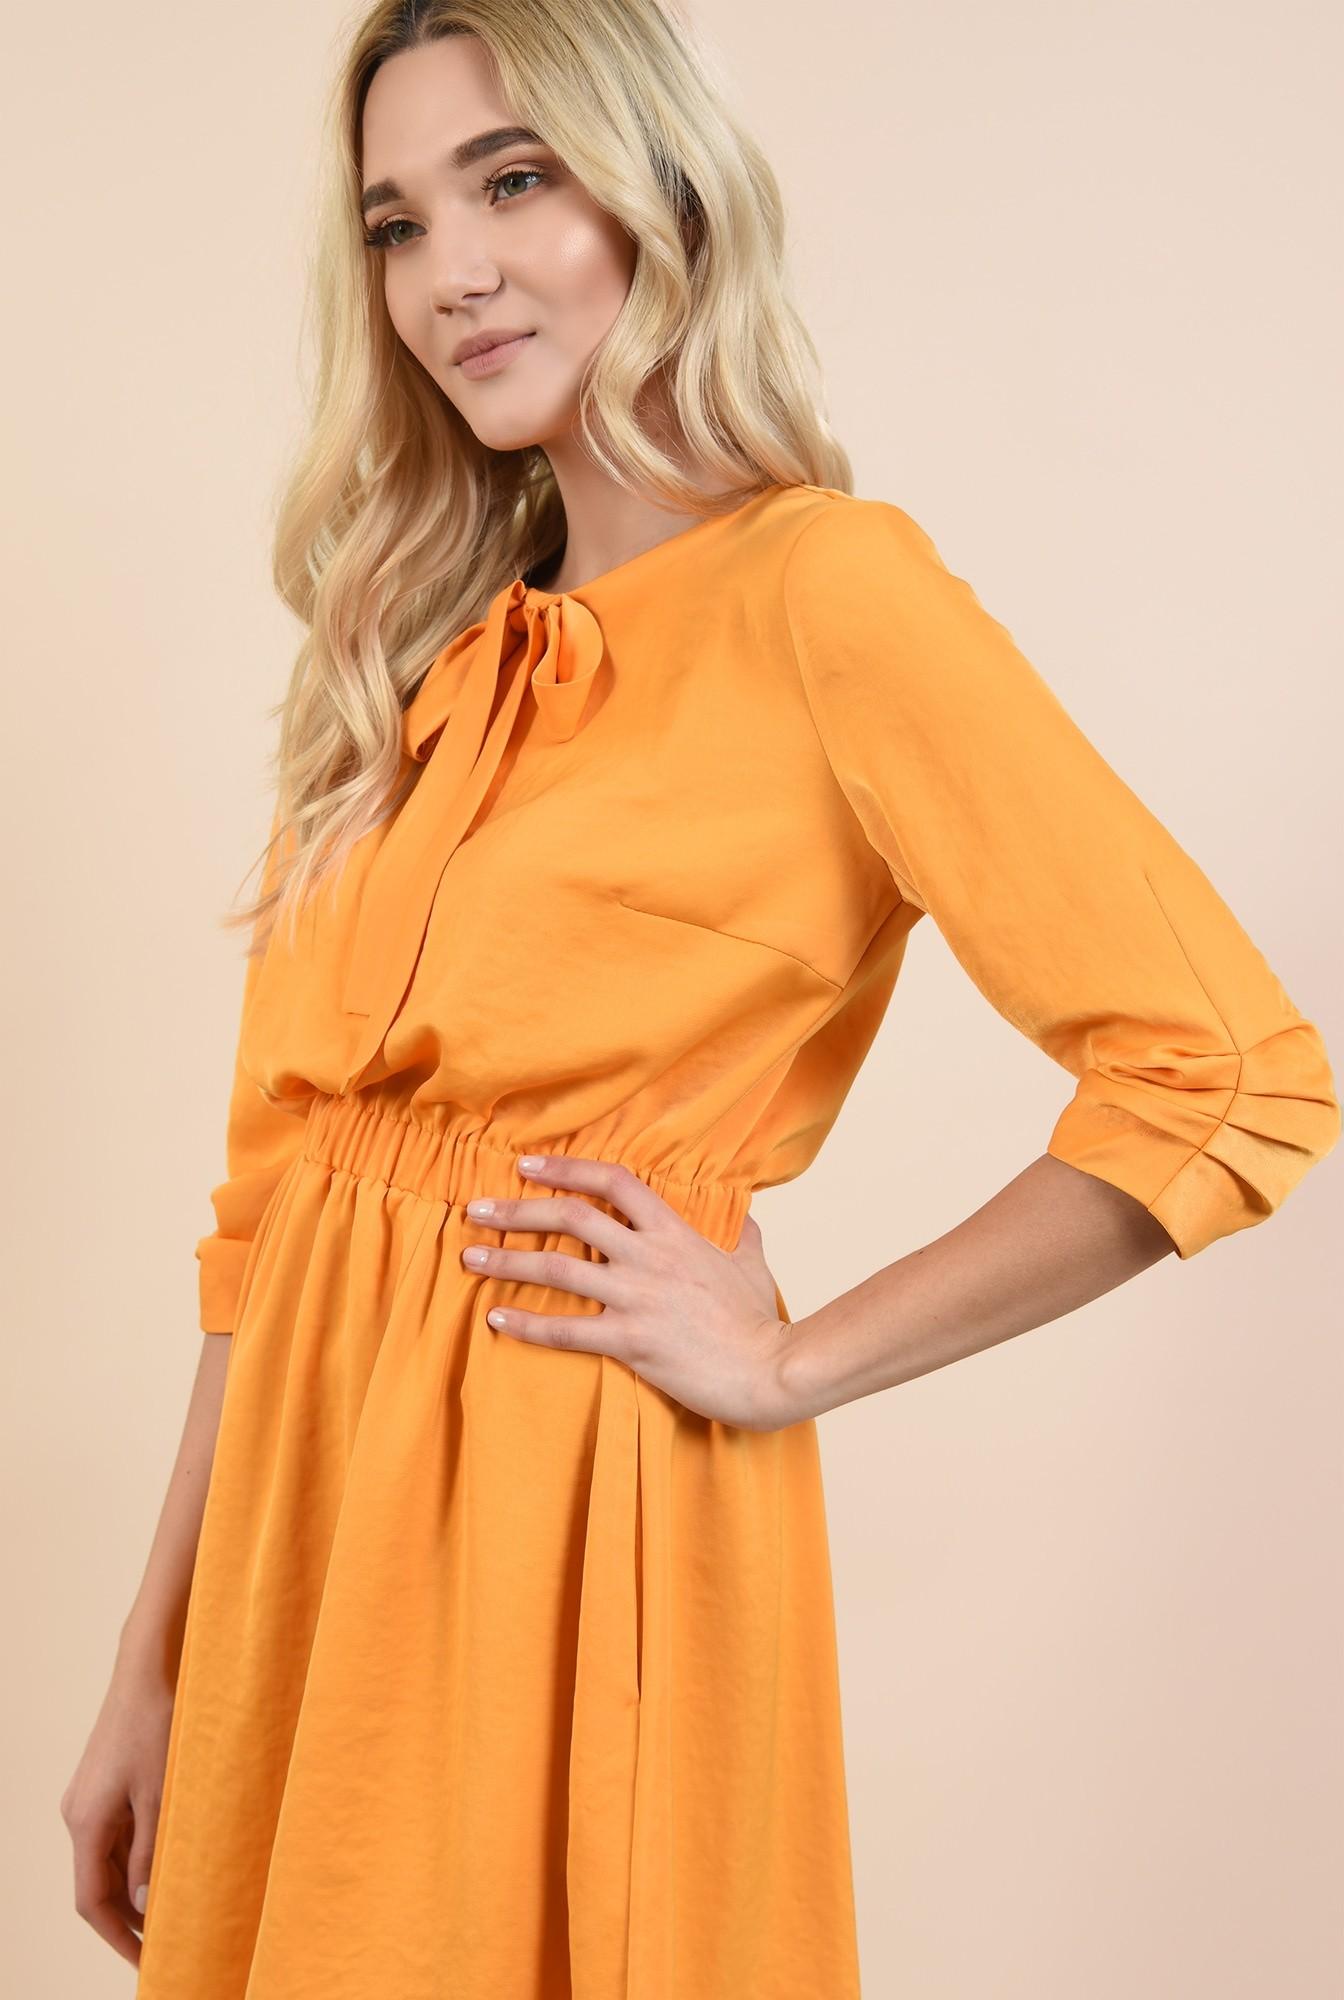 2 - rochii online, rochie mini, evazata, cu elastic la talie